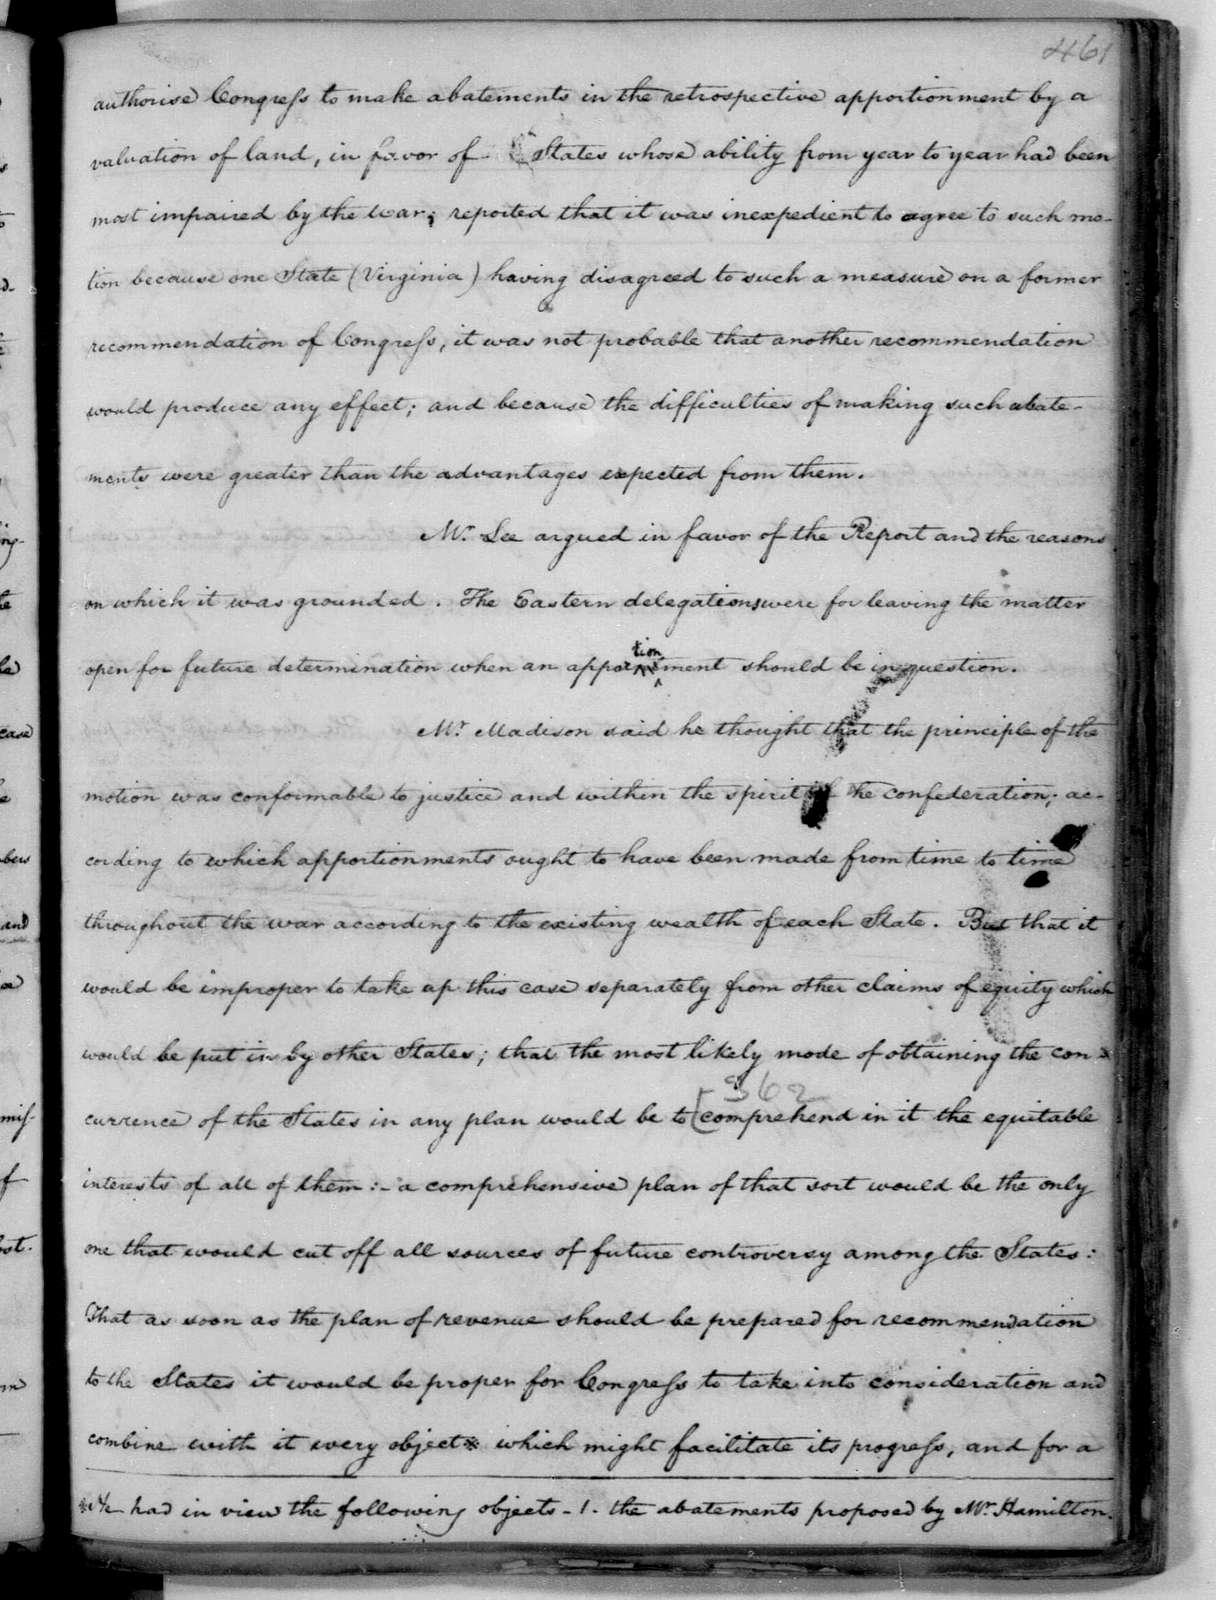 November 4, 1782. John C. Payne's copy of James Madison's Notes of the Continental Congress Debates.